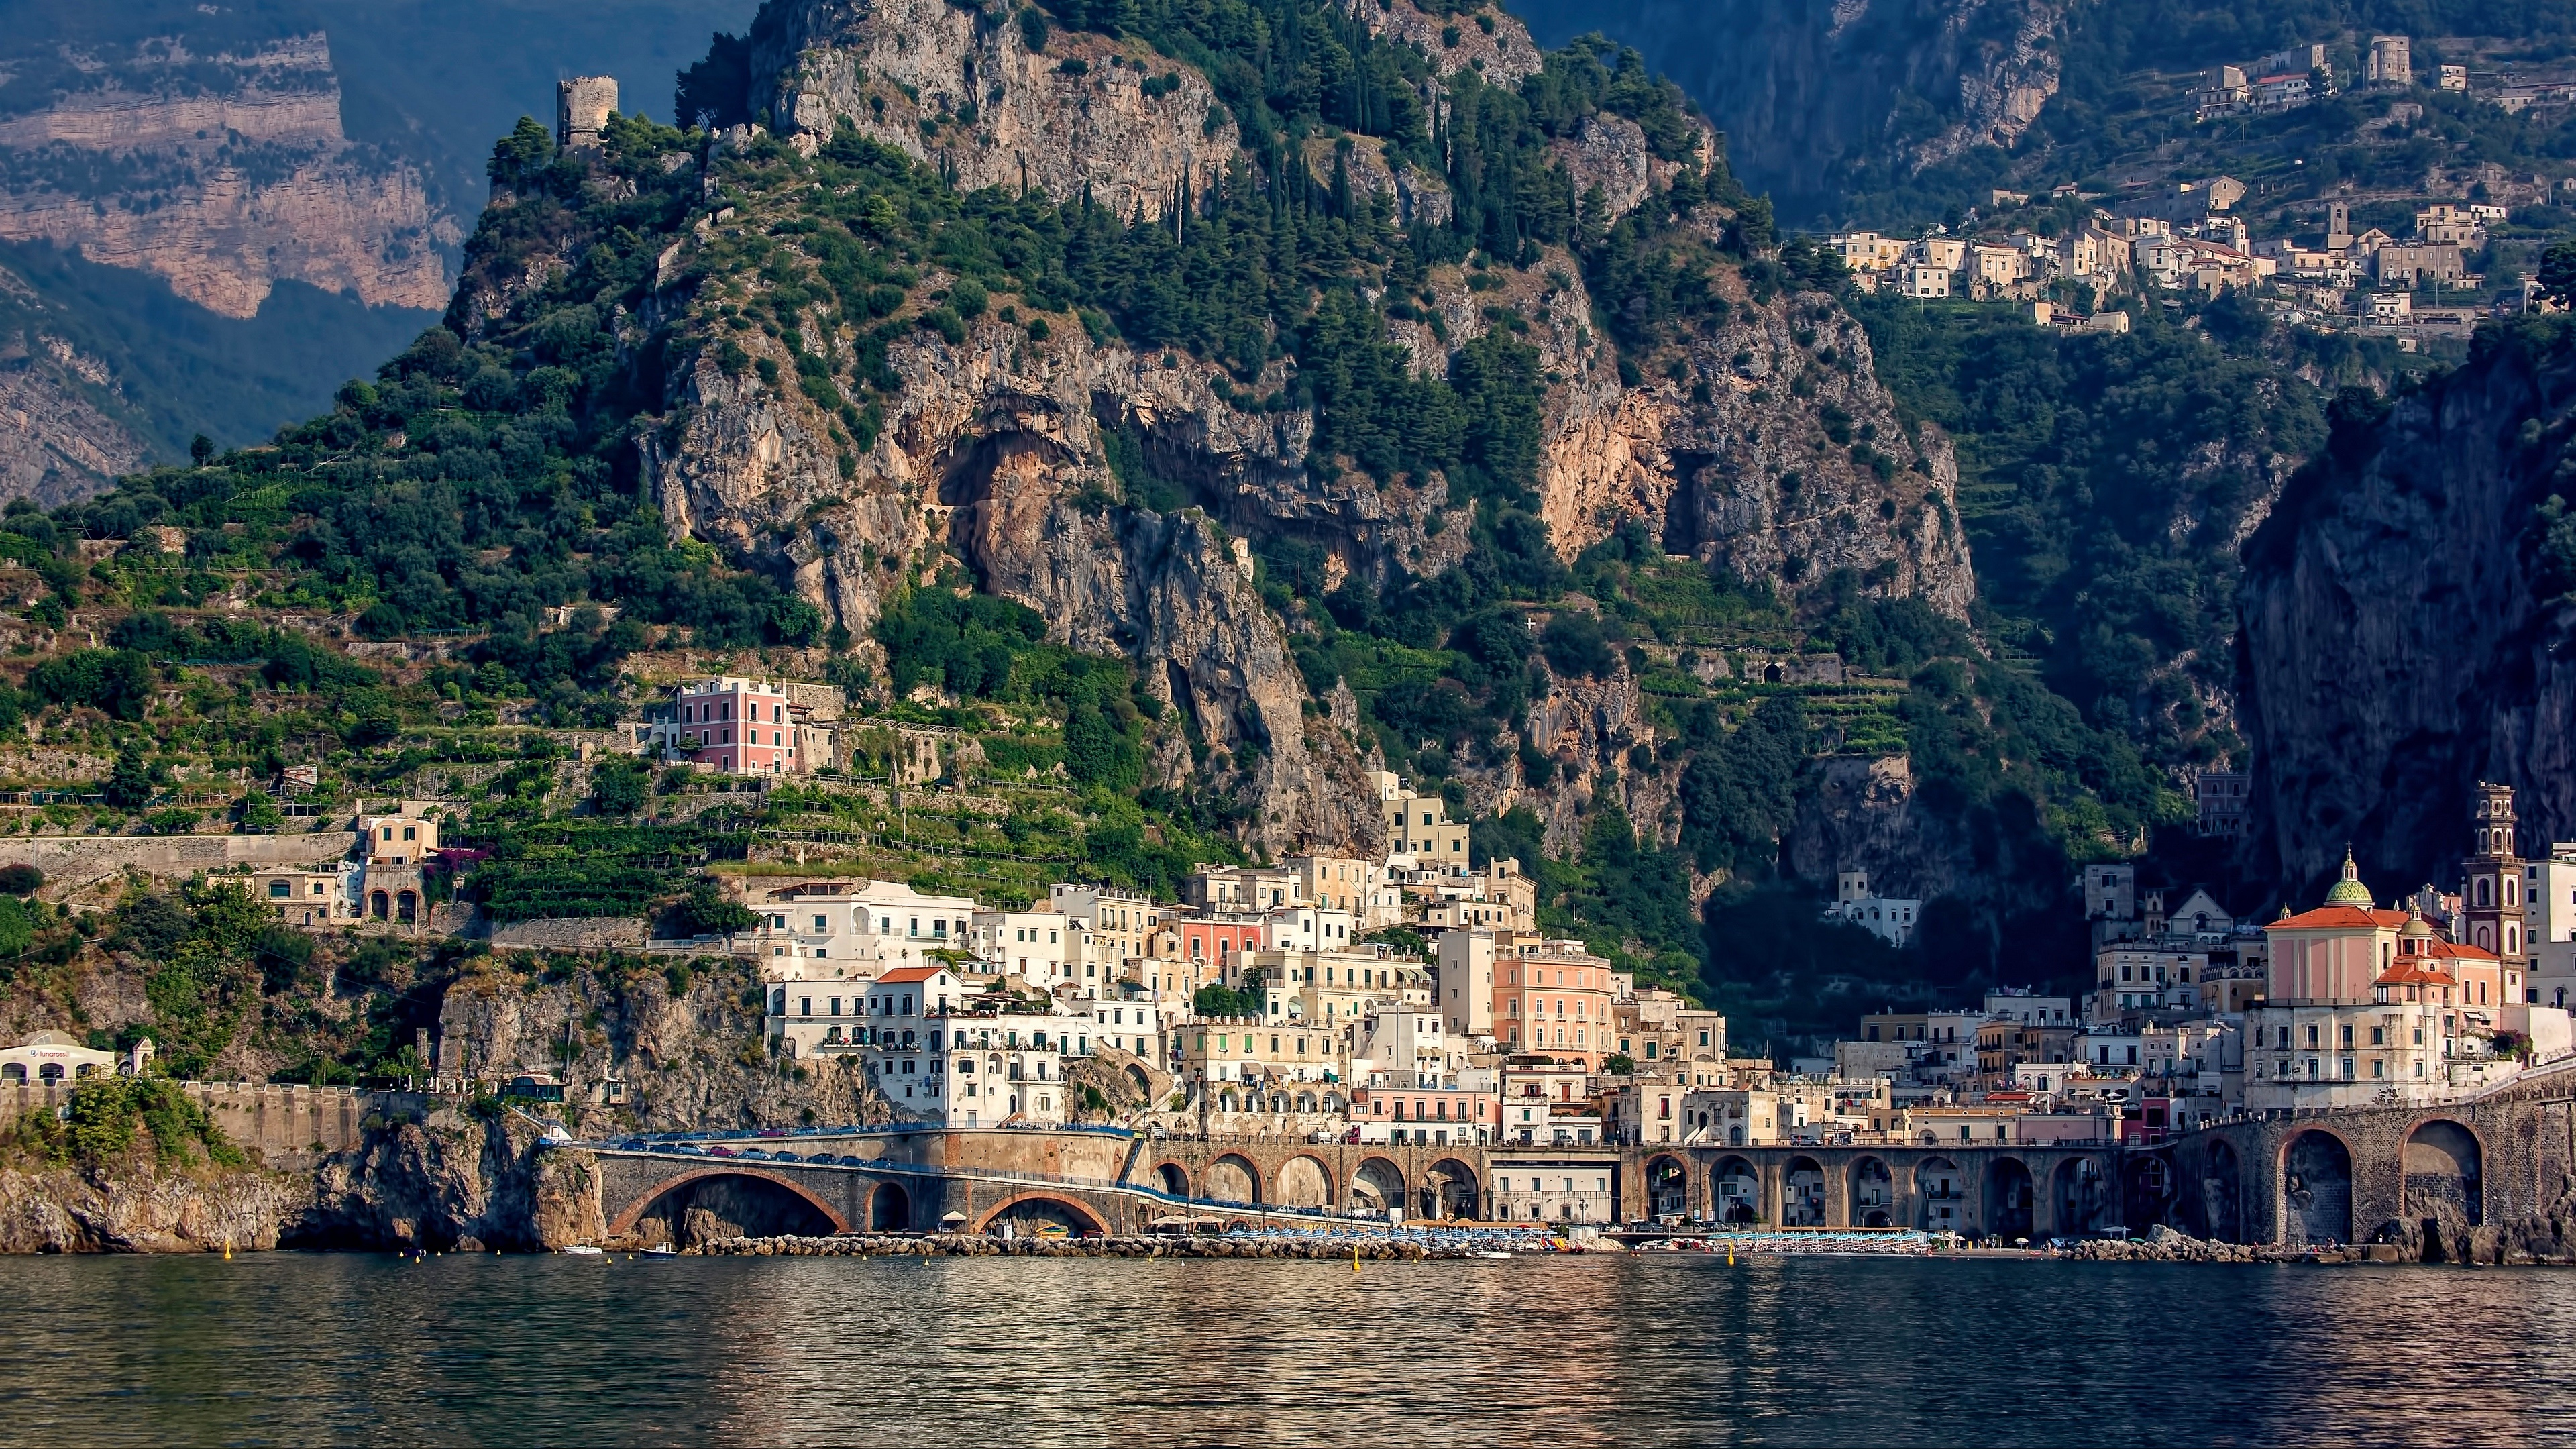 Amalfi from the Tyrrhenian Sea (Italy) wallpaper